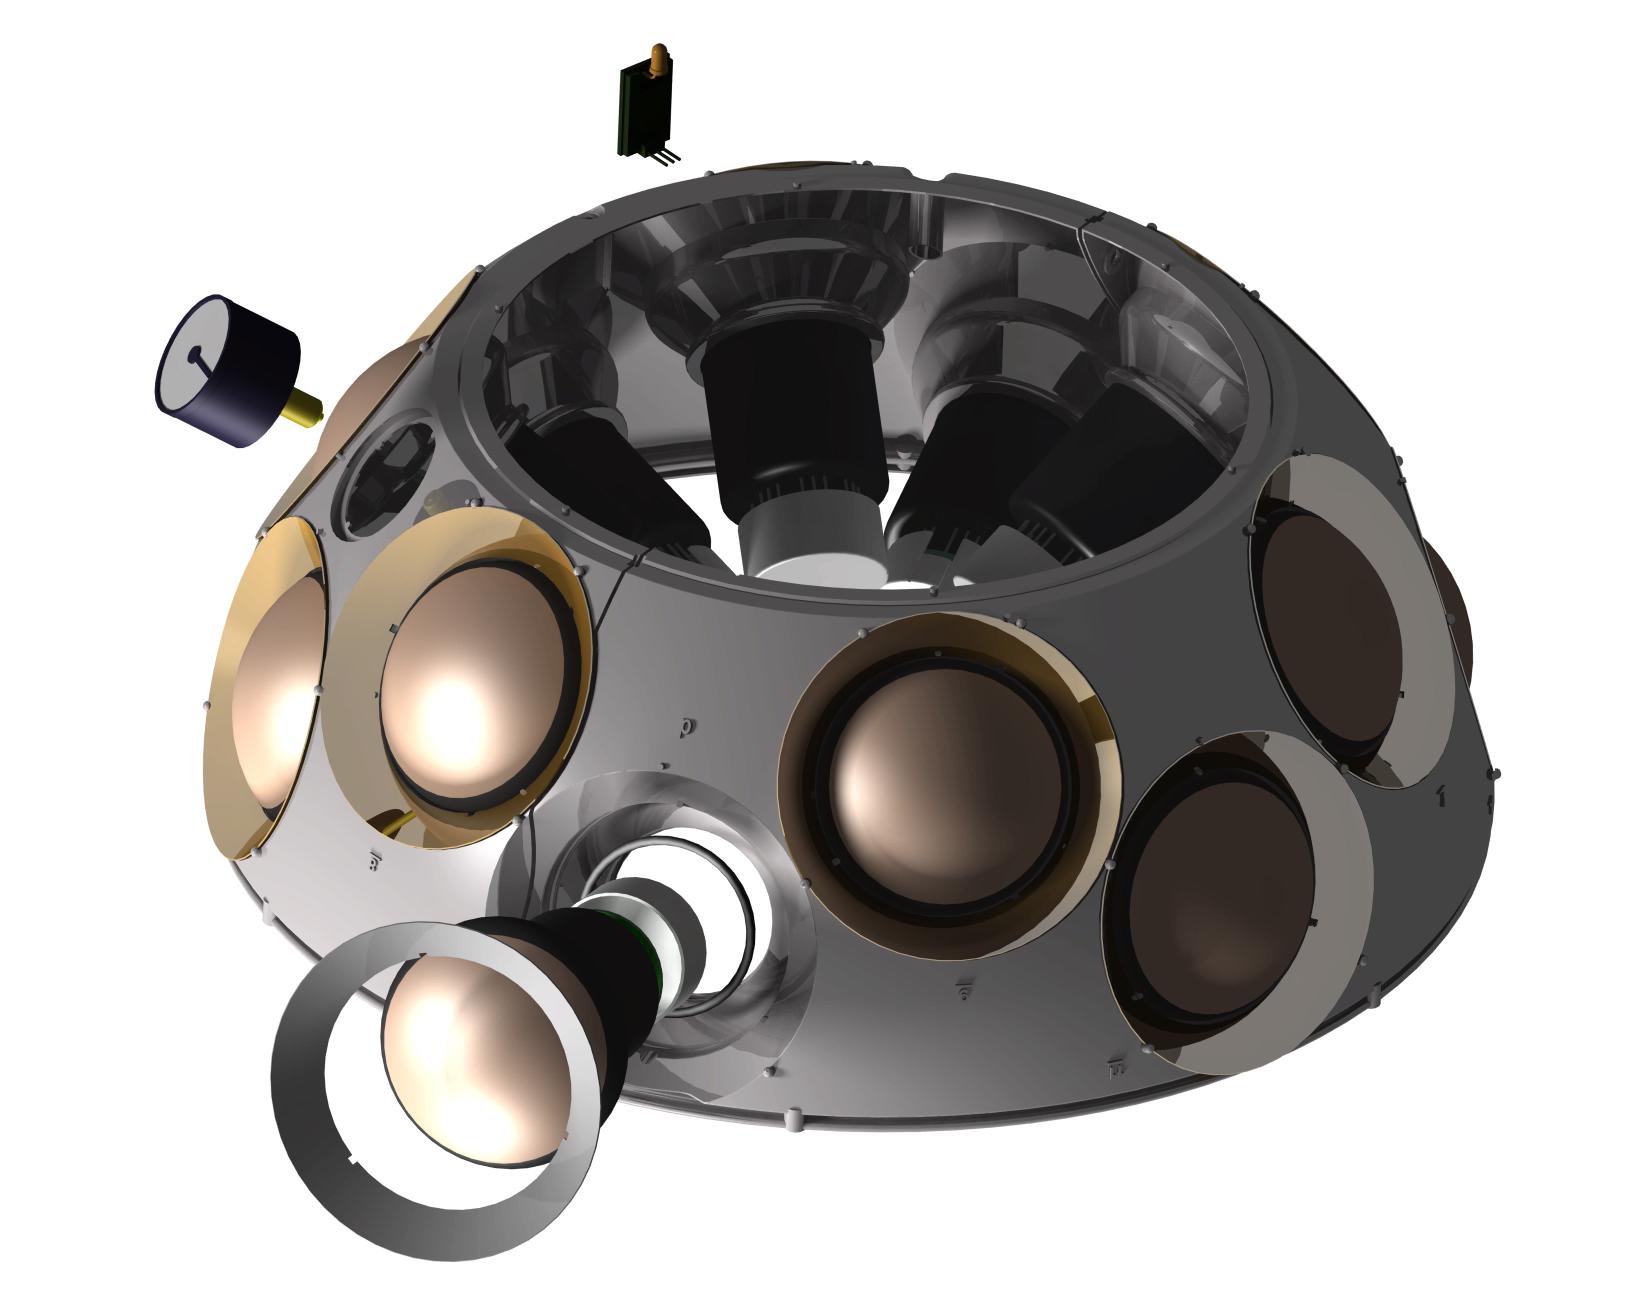 A render of the 3D printed DOM sphere to be installed on the ocean floor. Image via Weerg